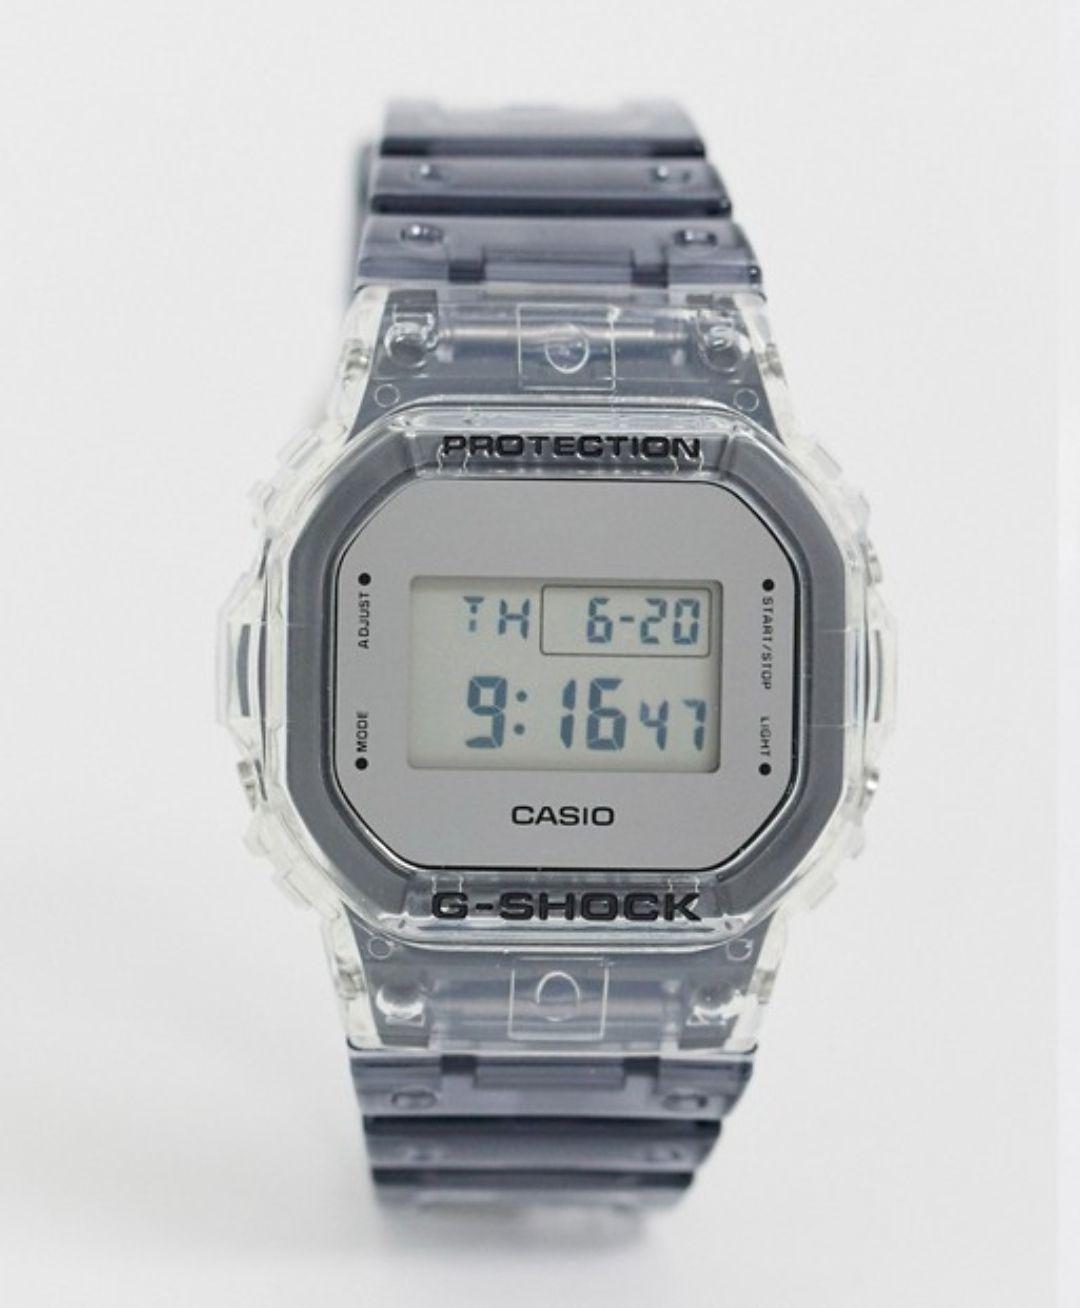 Montre Casio G-Shock See-thru Tough - Boitier 13 mm